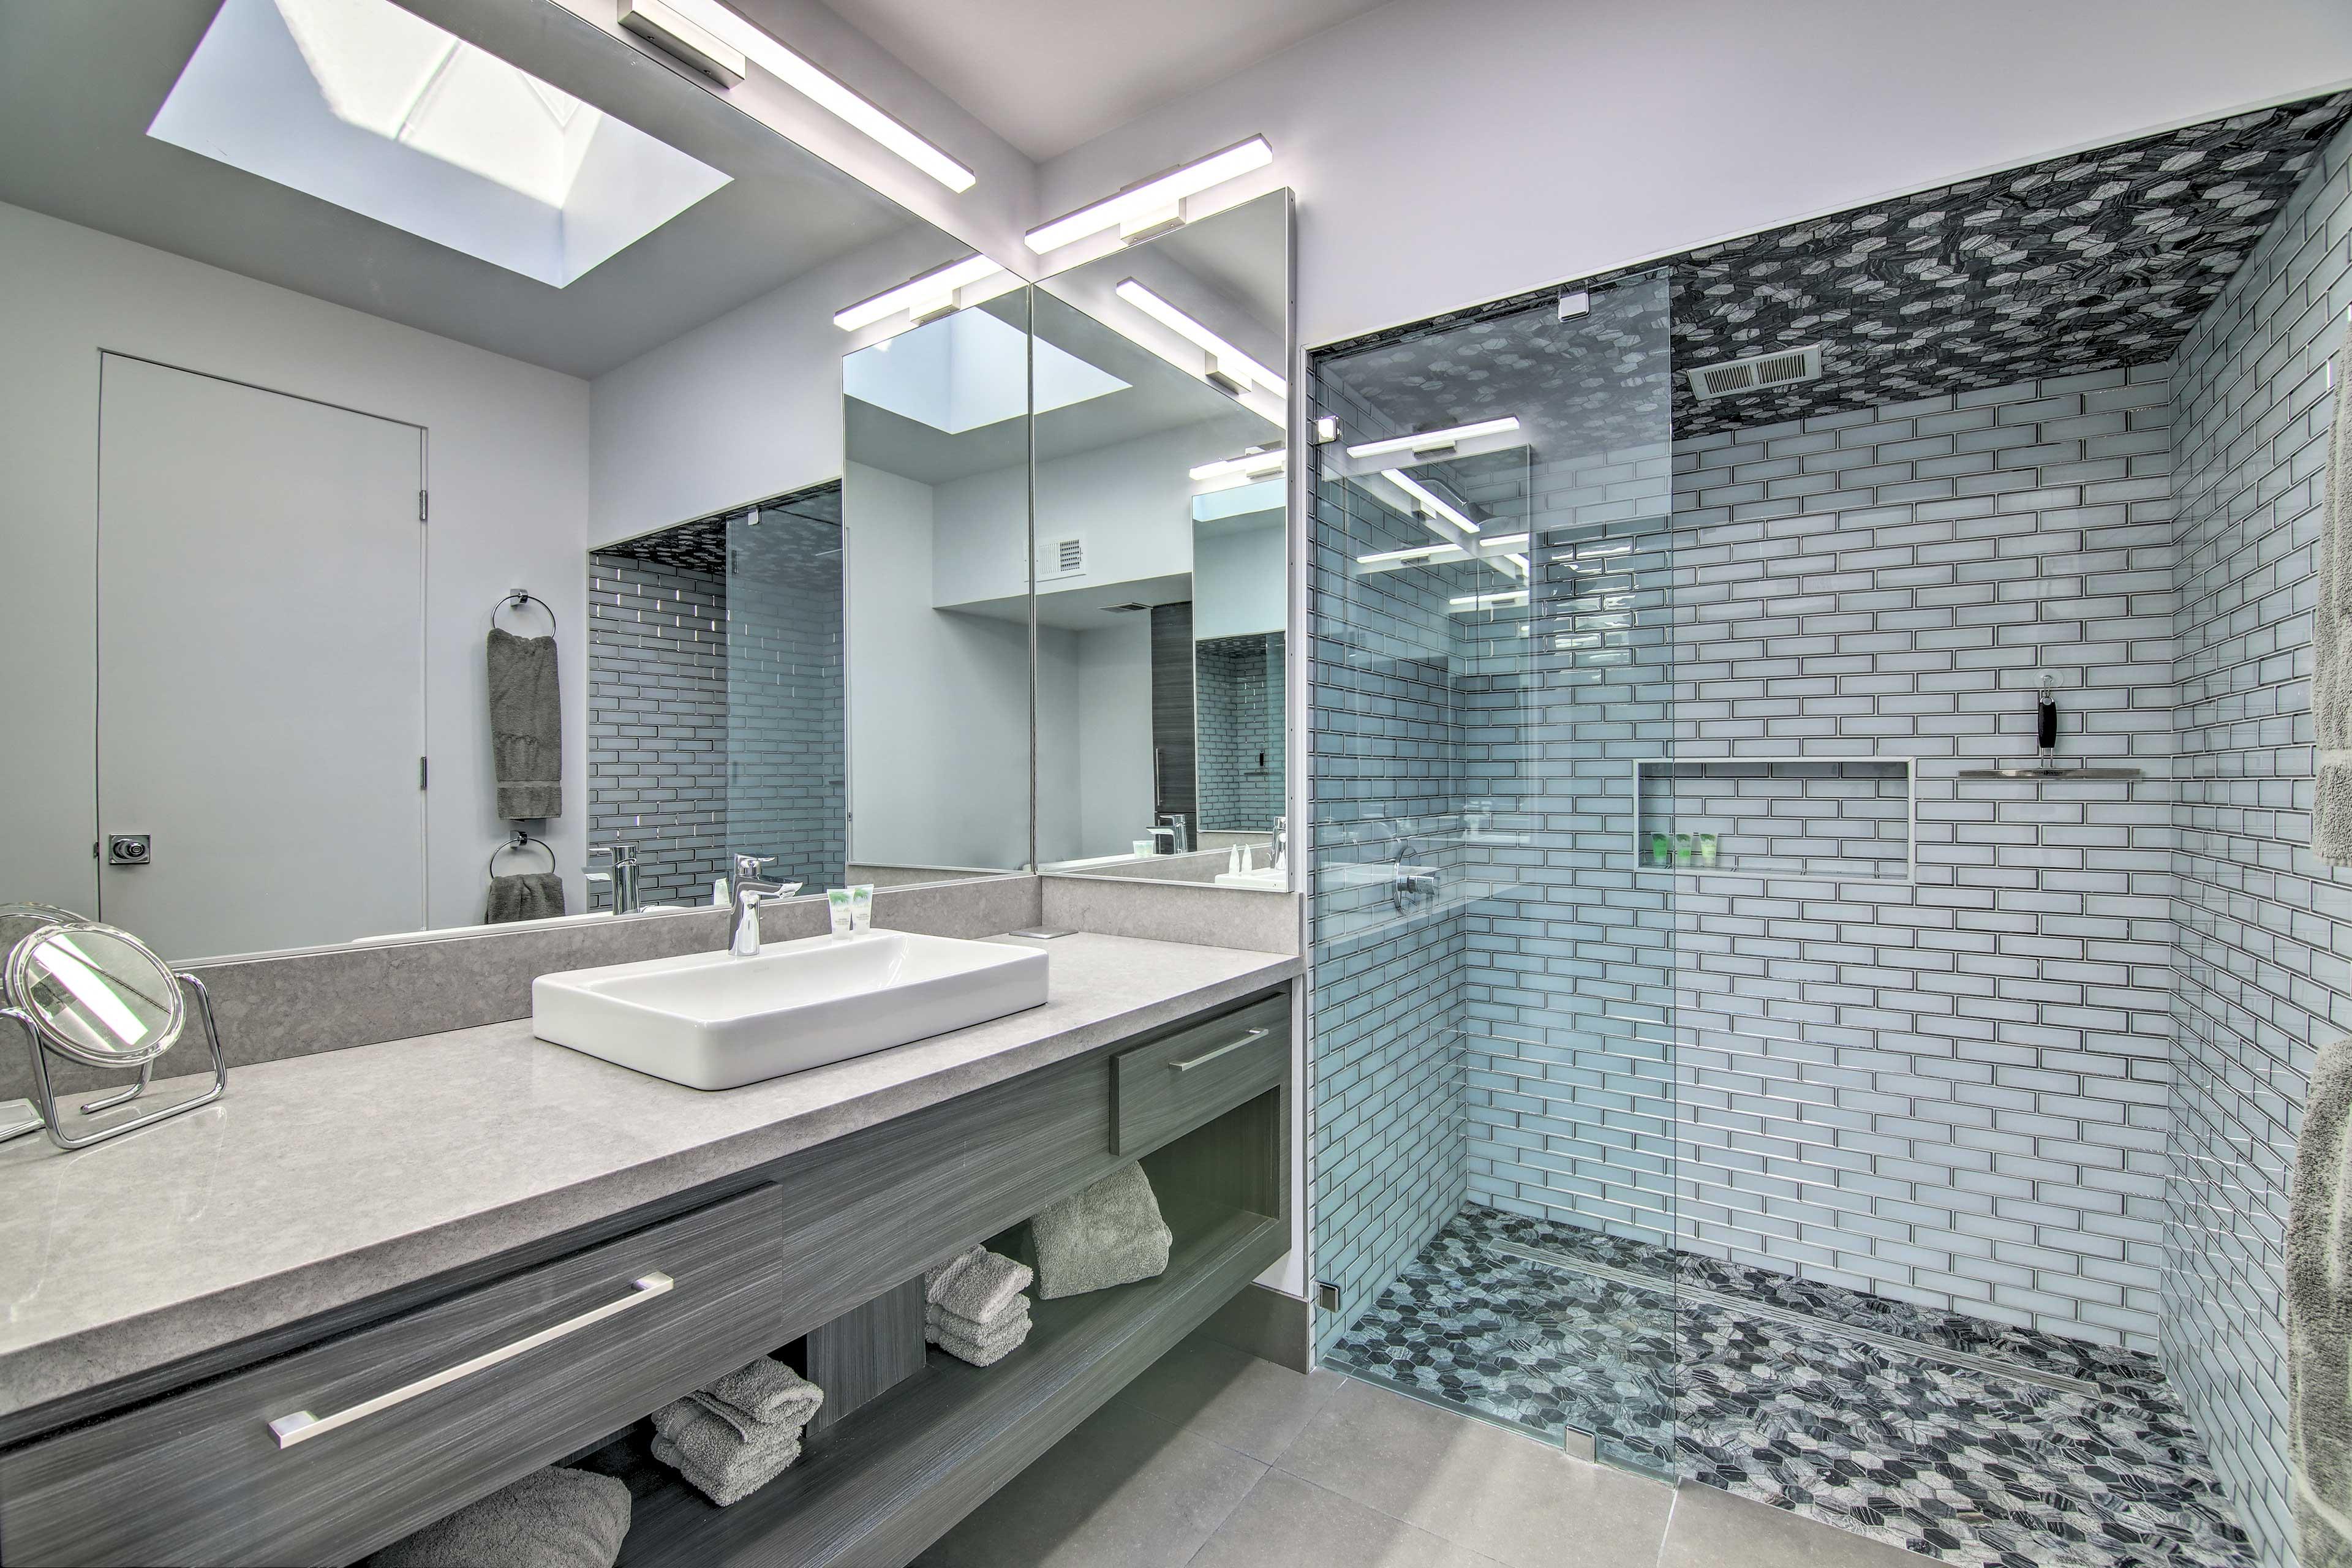 Bathroom | Walk-In Shower | Towels Provided | Hair Dryer